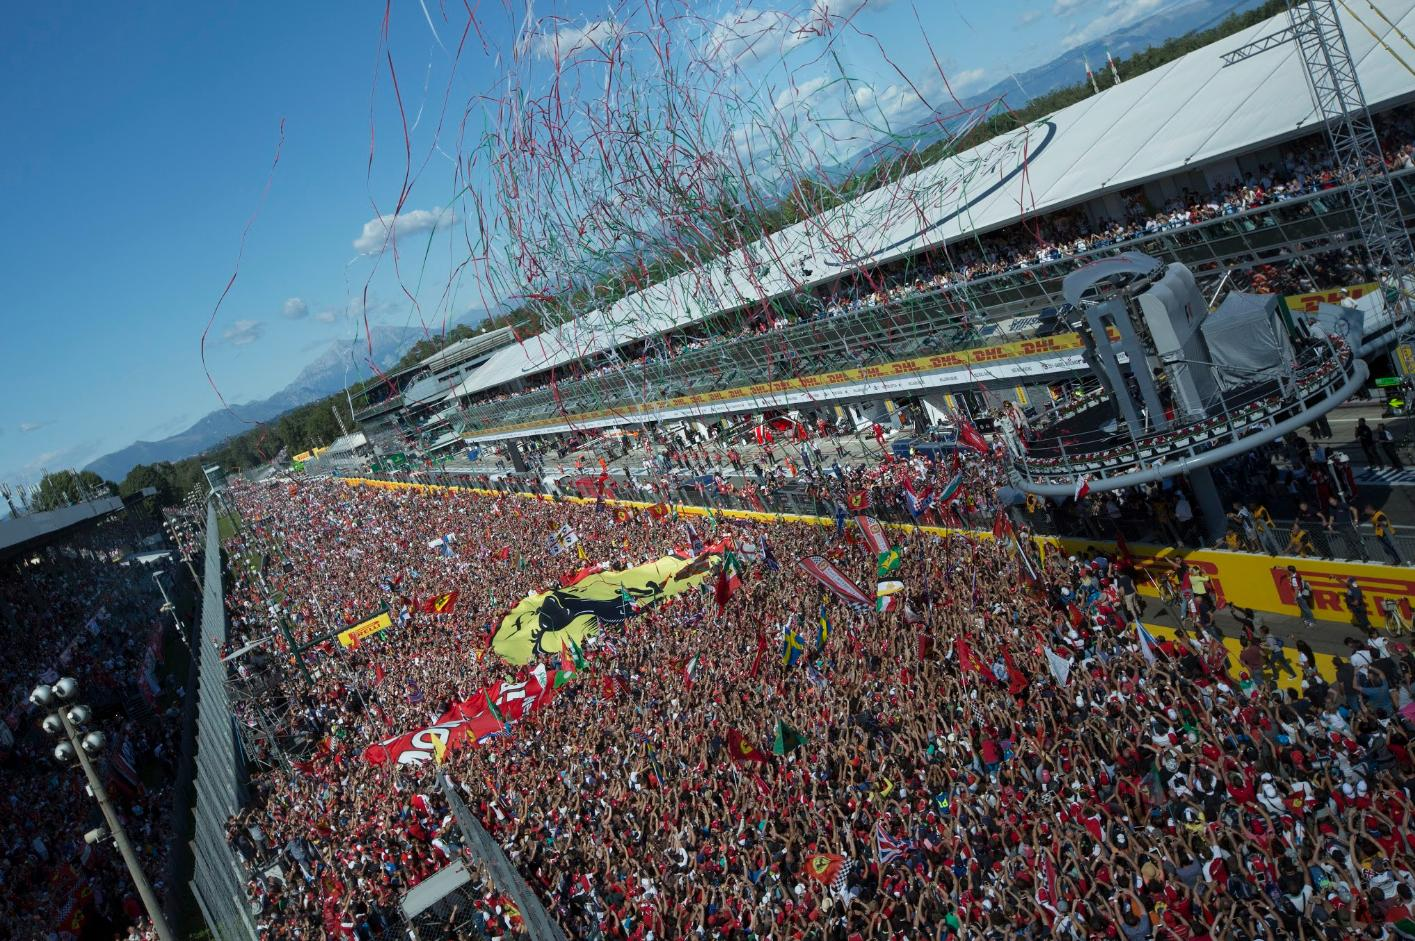 Volle bak na de Italiaanse Grand Prix in Monza (Foto: WikiCommons)